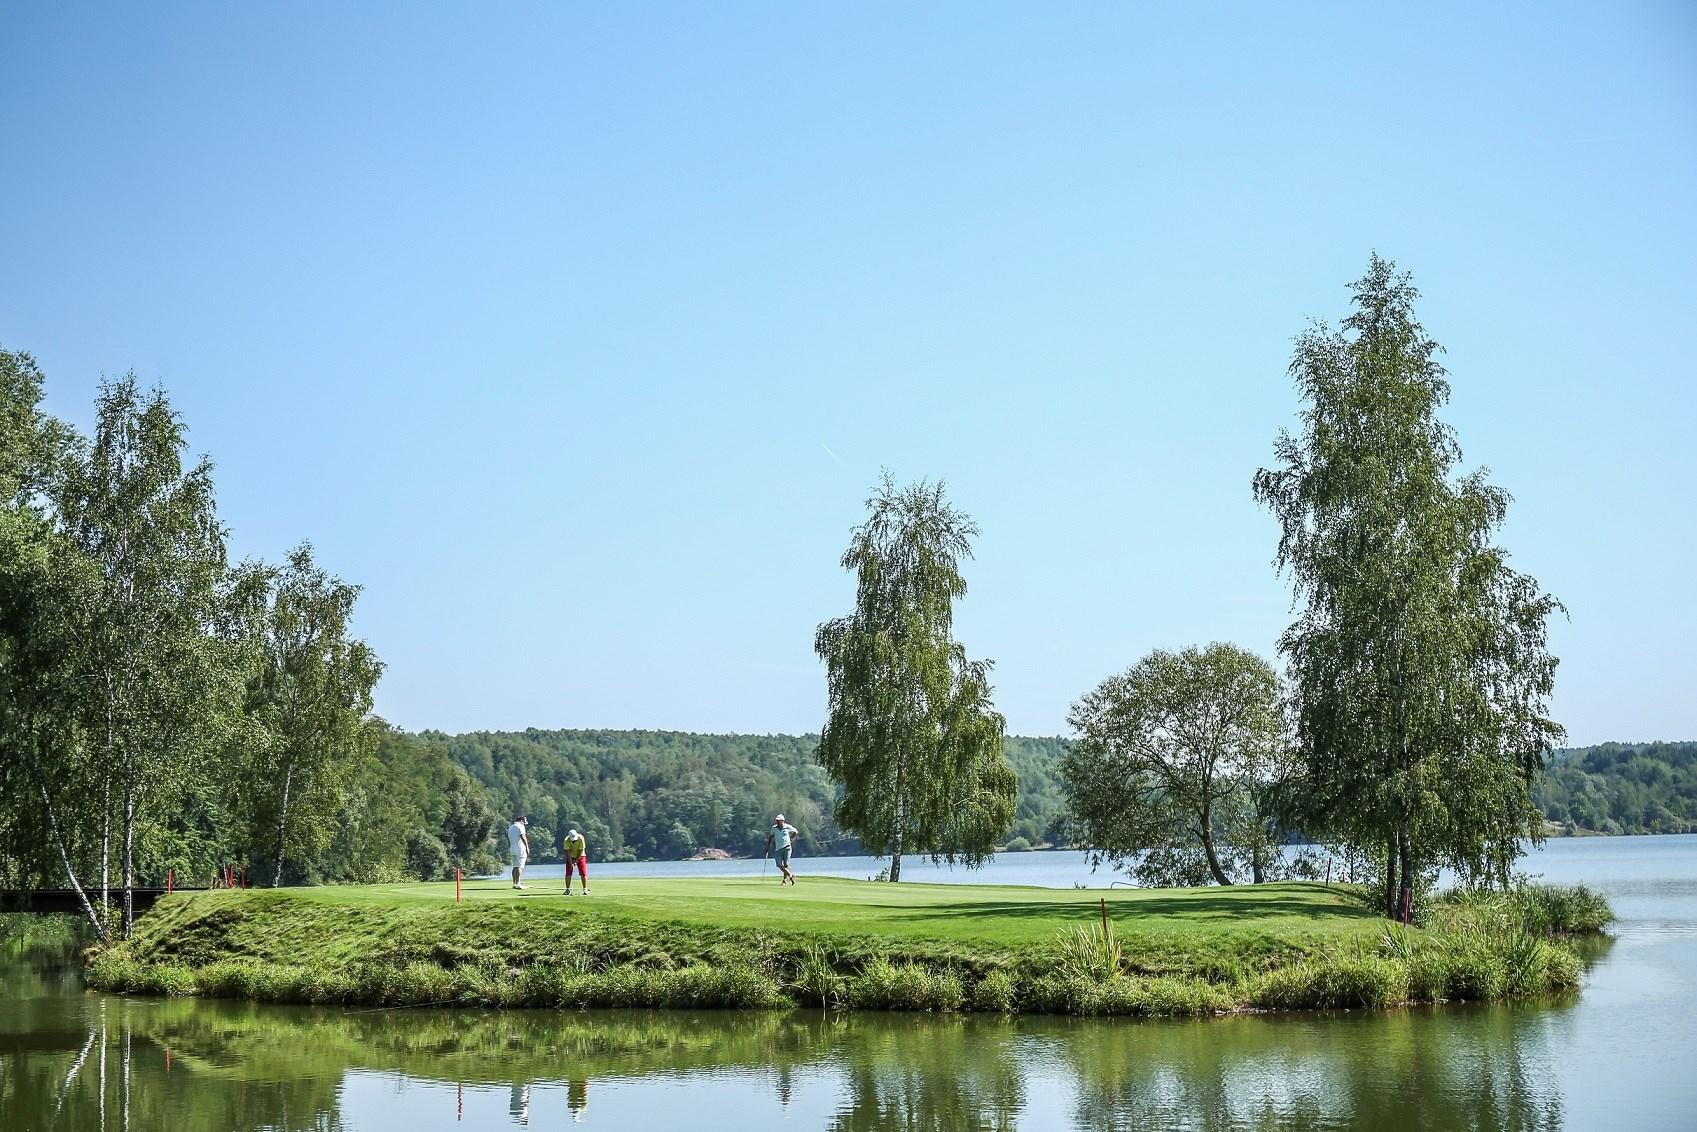 Golf_Greensgate_04.jpg